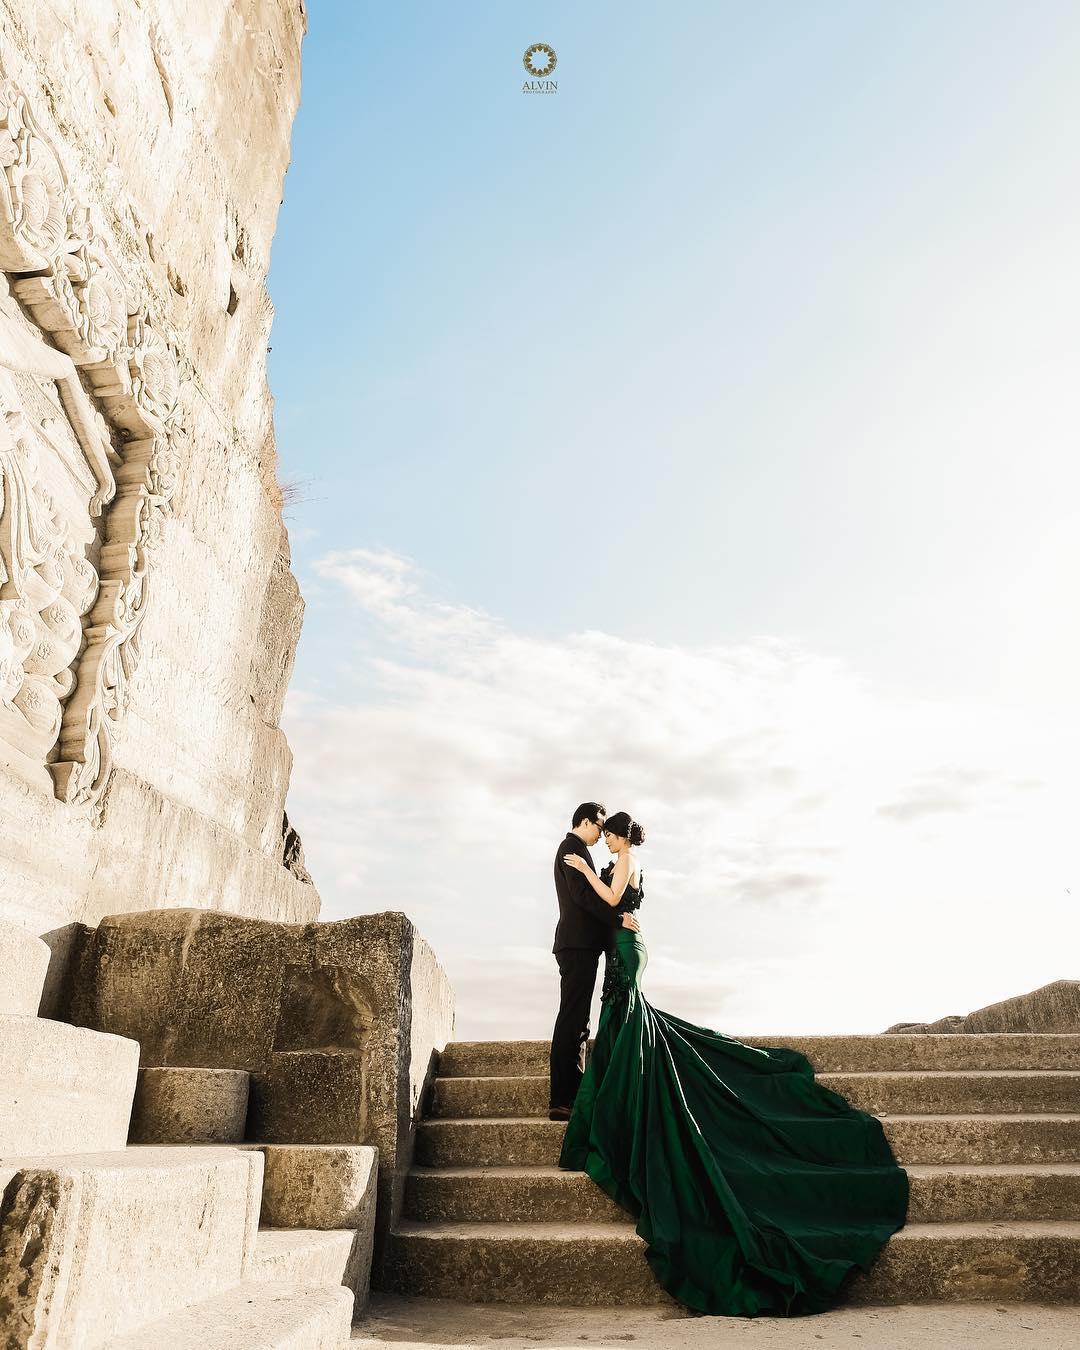 37817652 1839575786351522 5489882177623556096 N : Lokasi Foto Pre Wedding Jogja